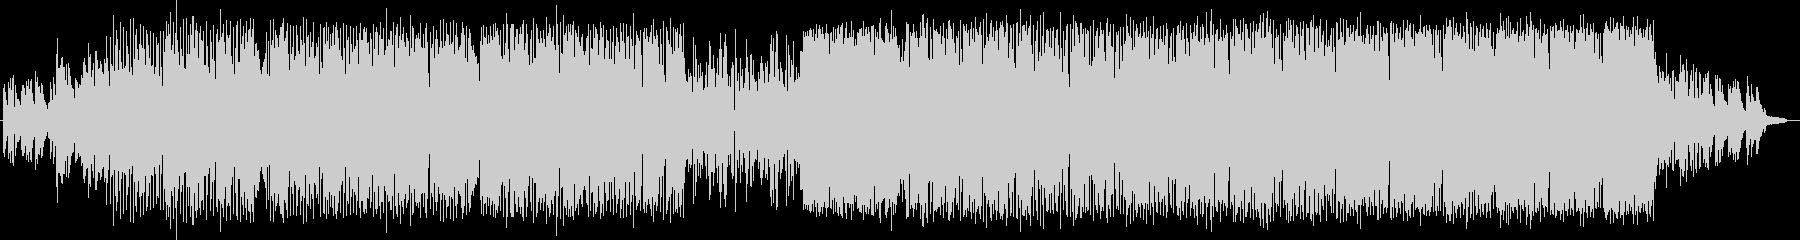 House-Popの未再生の波形